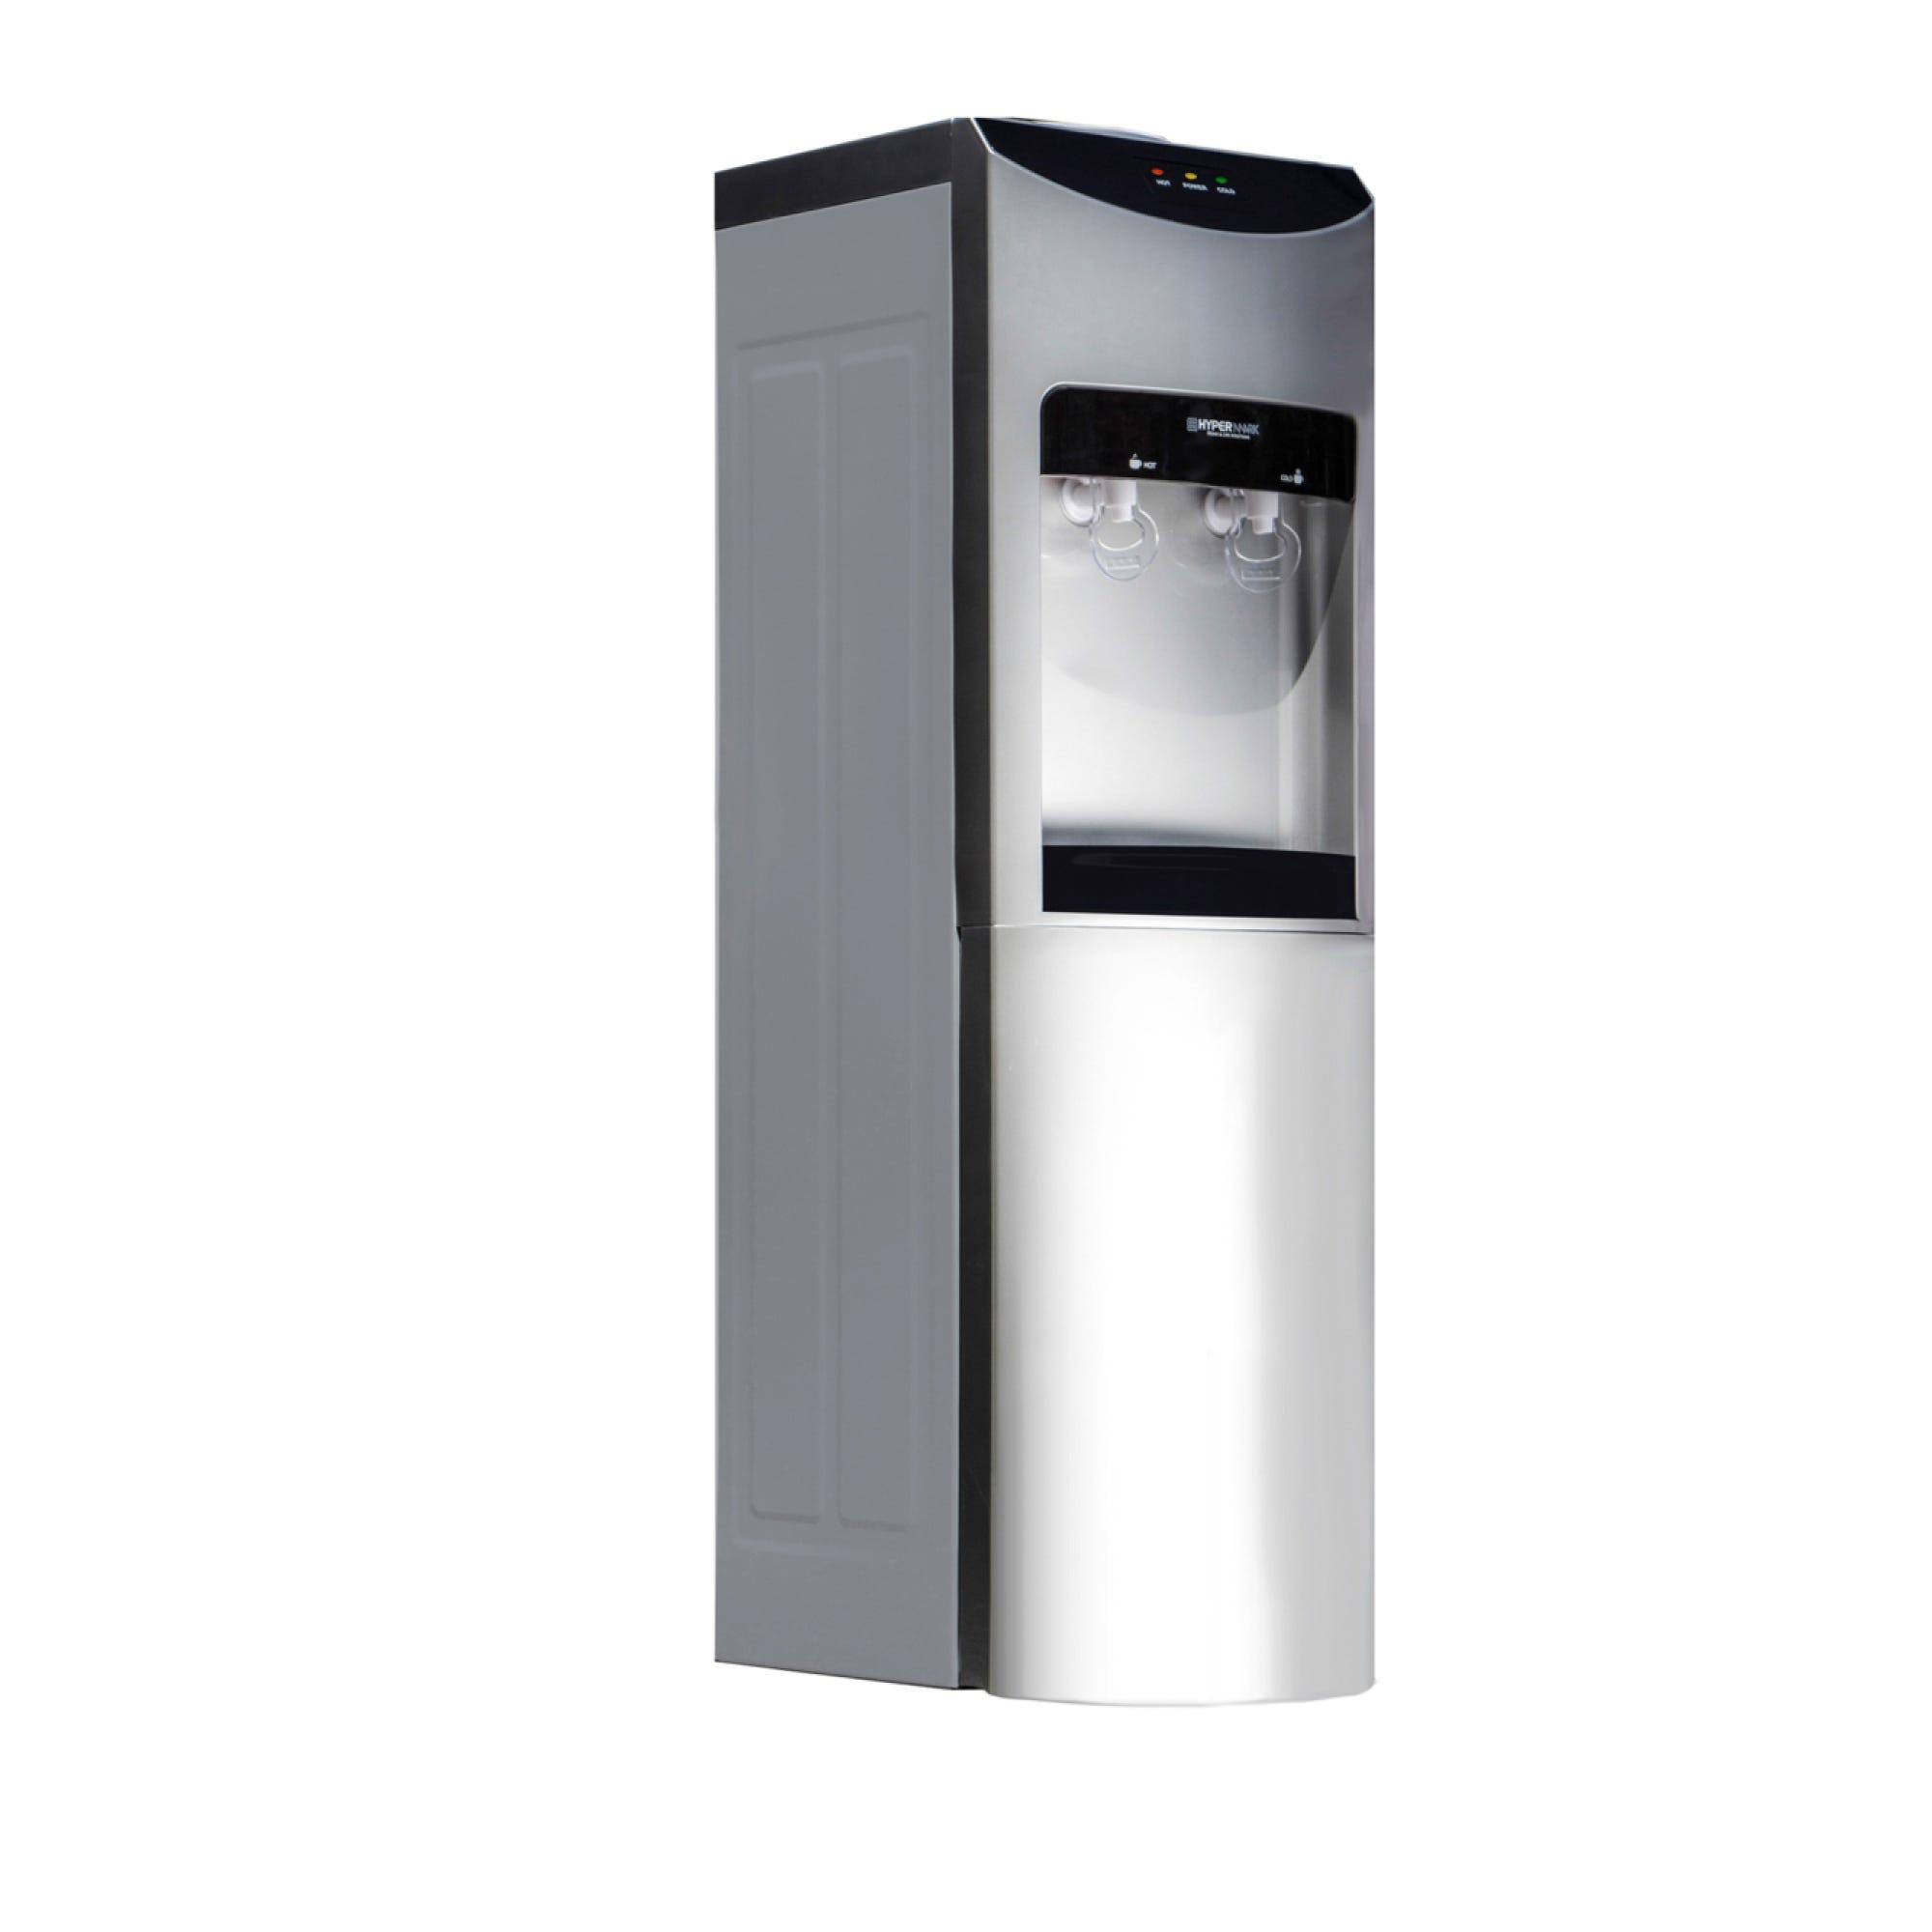 Dispensador de agua Hypermark Cleanwater de pedestal